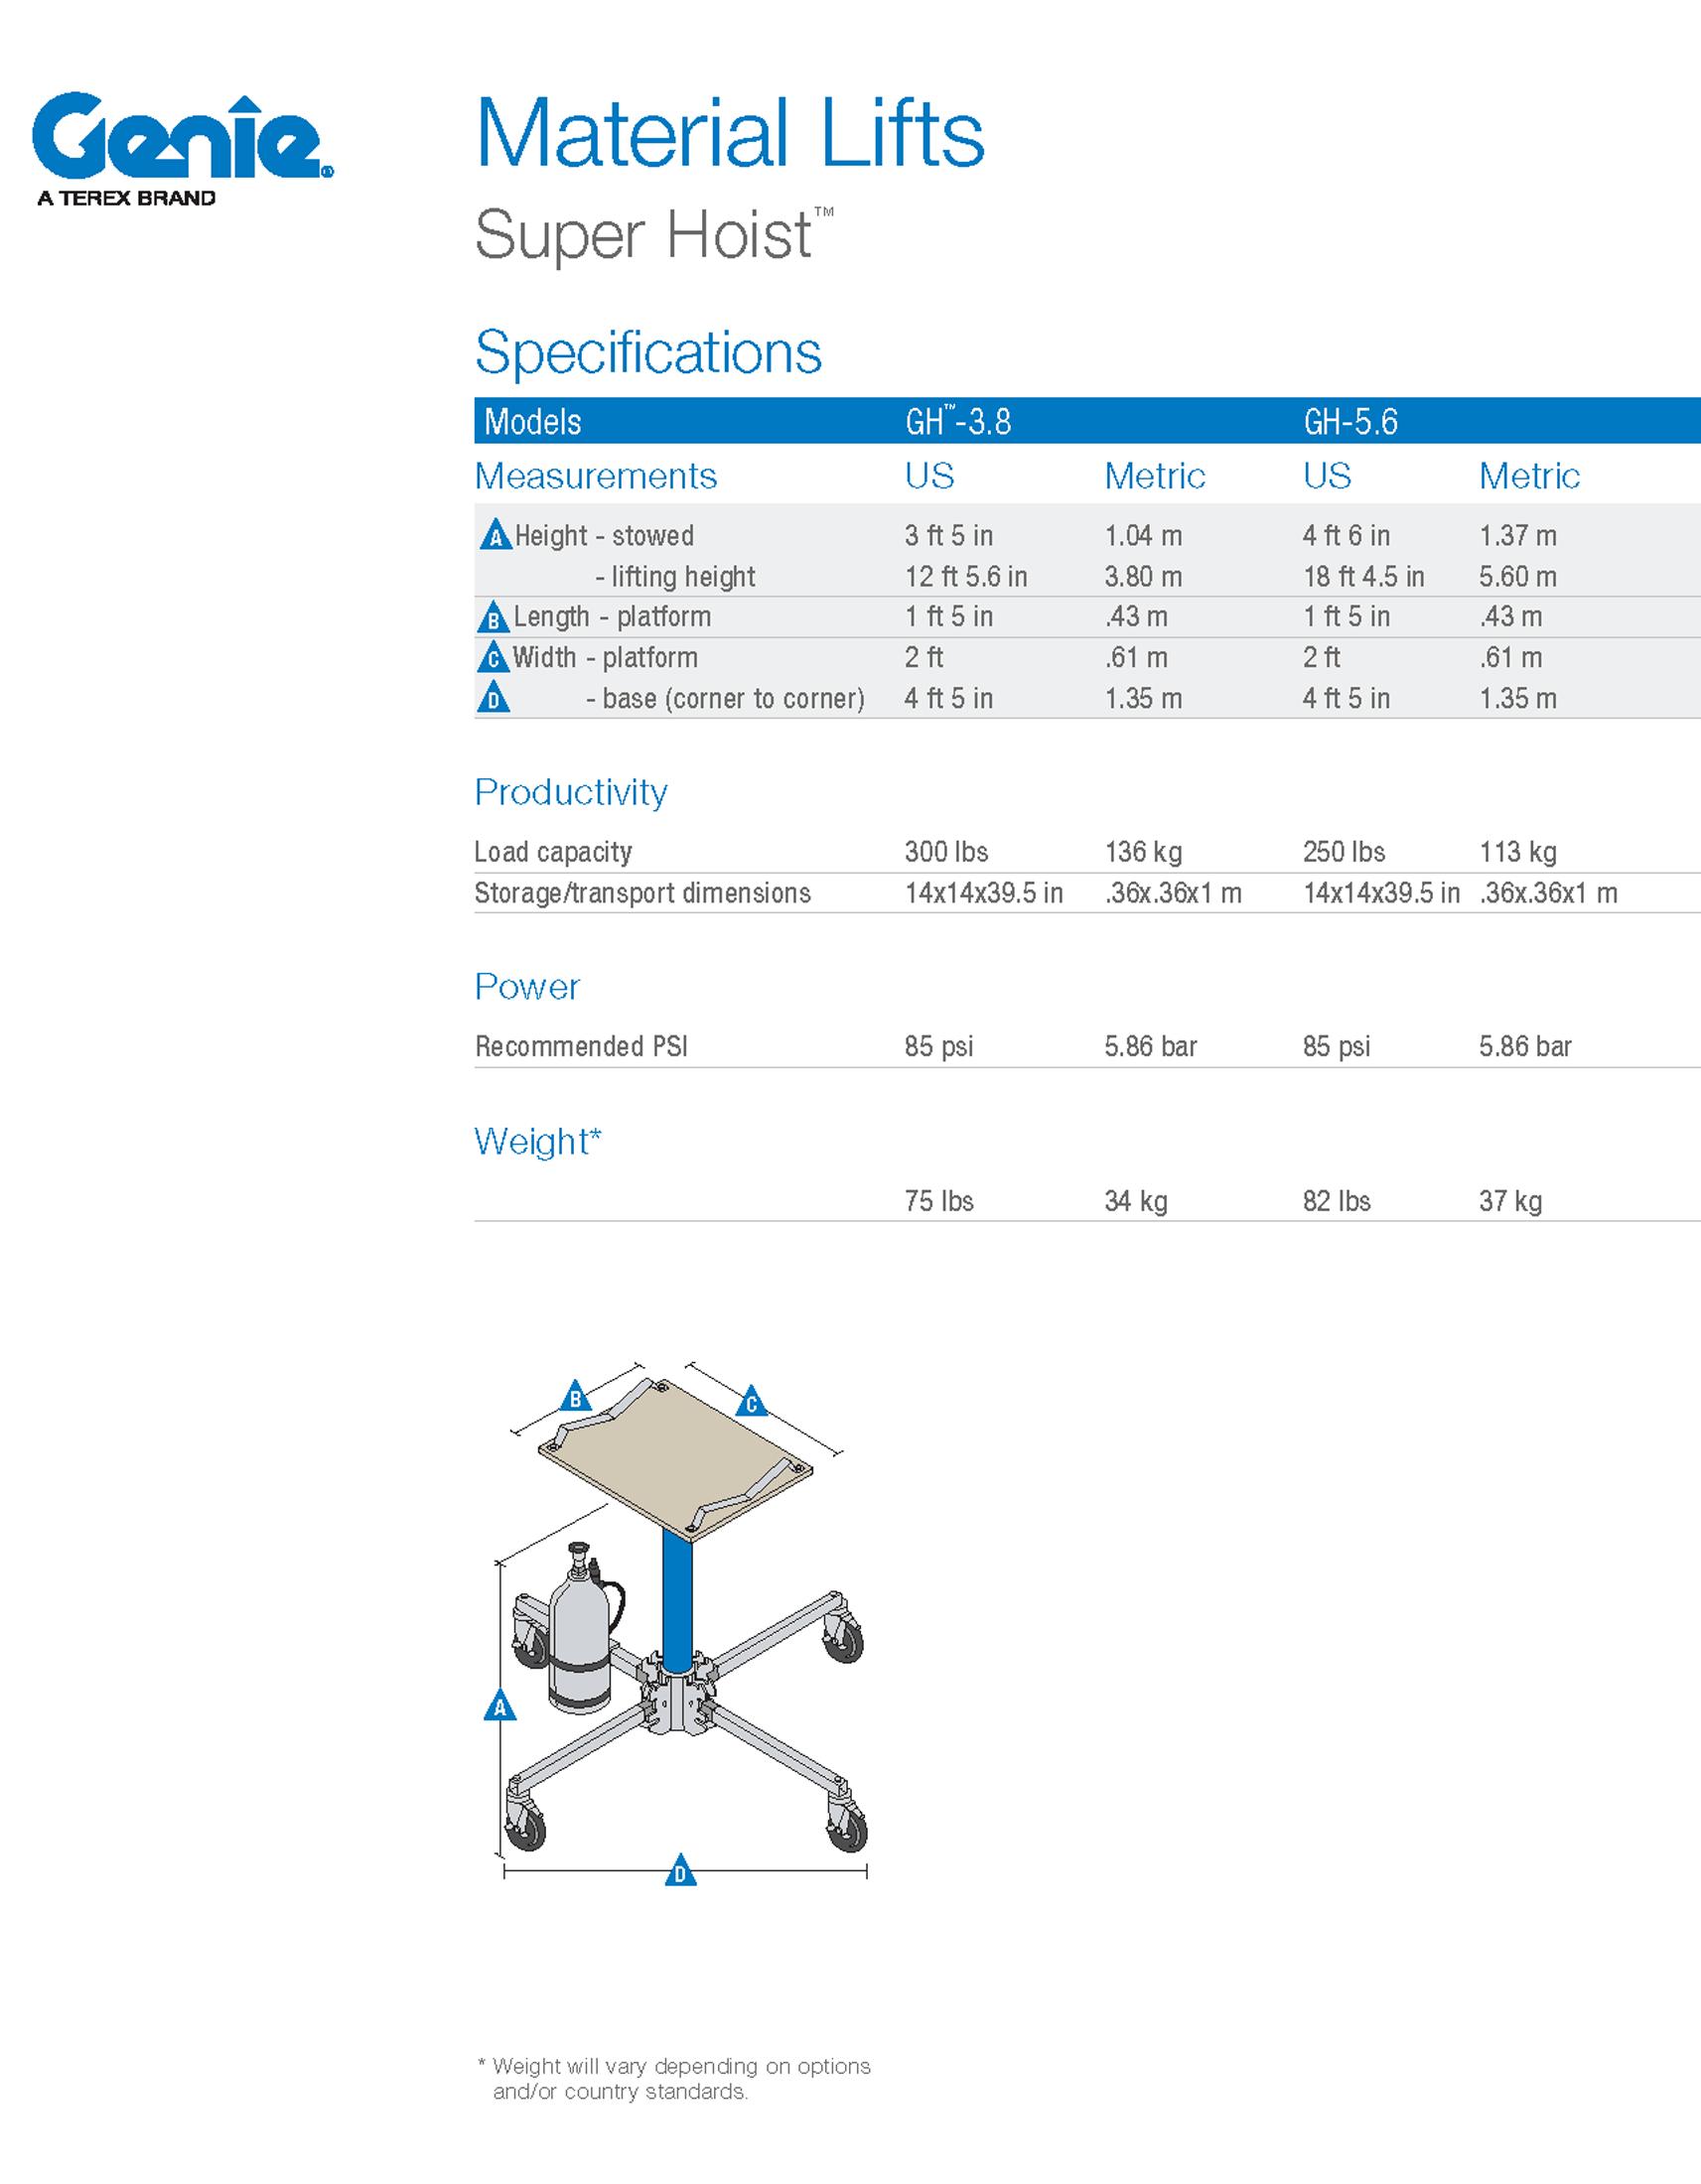 Genie GH-5 6 Super Hoist Hire | Material Lift Hire | Smiths